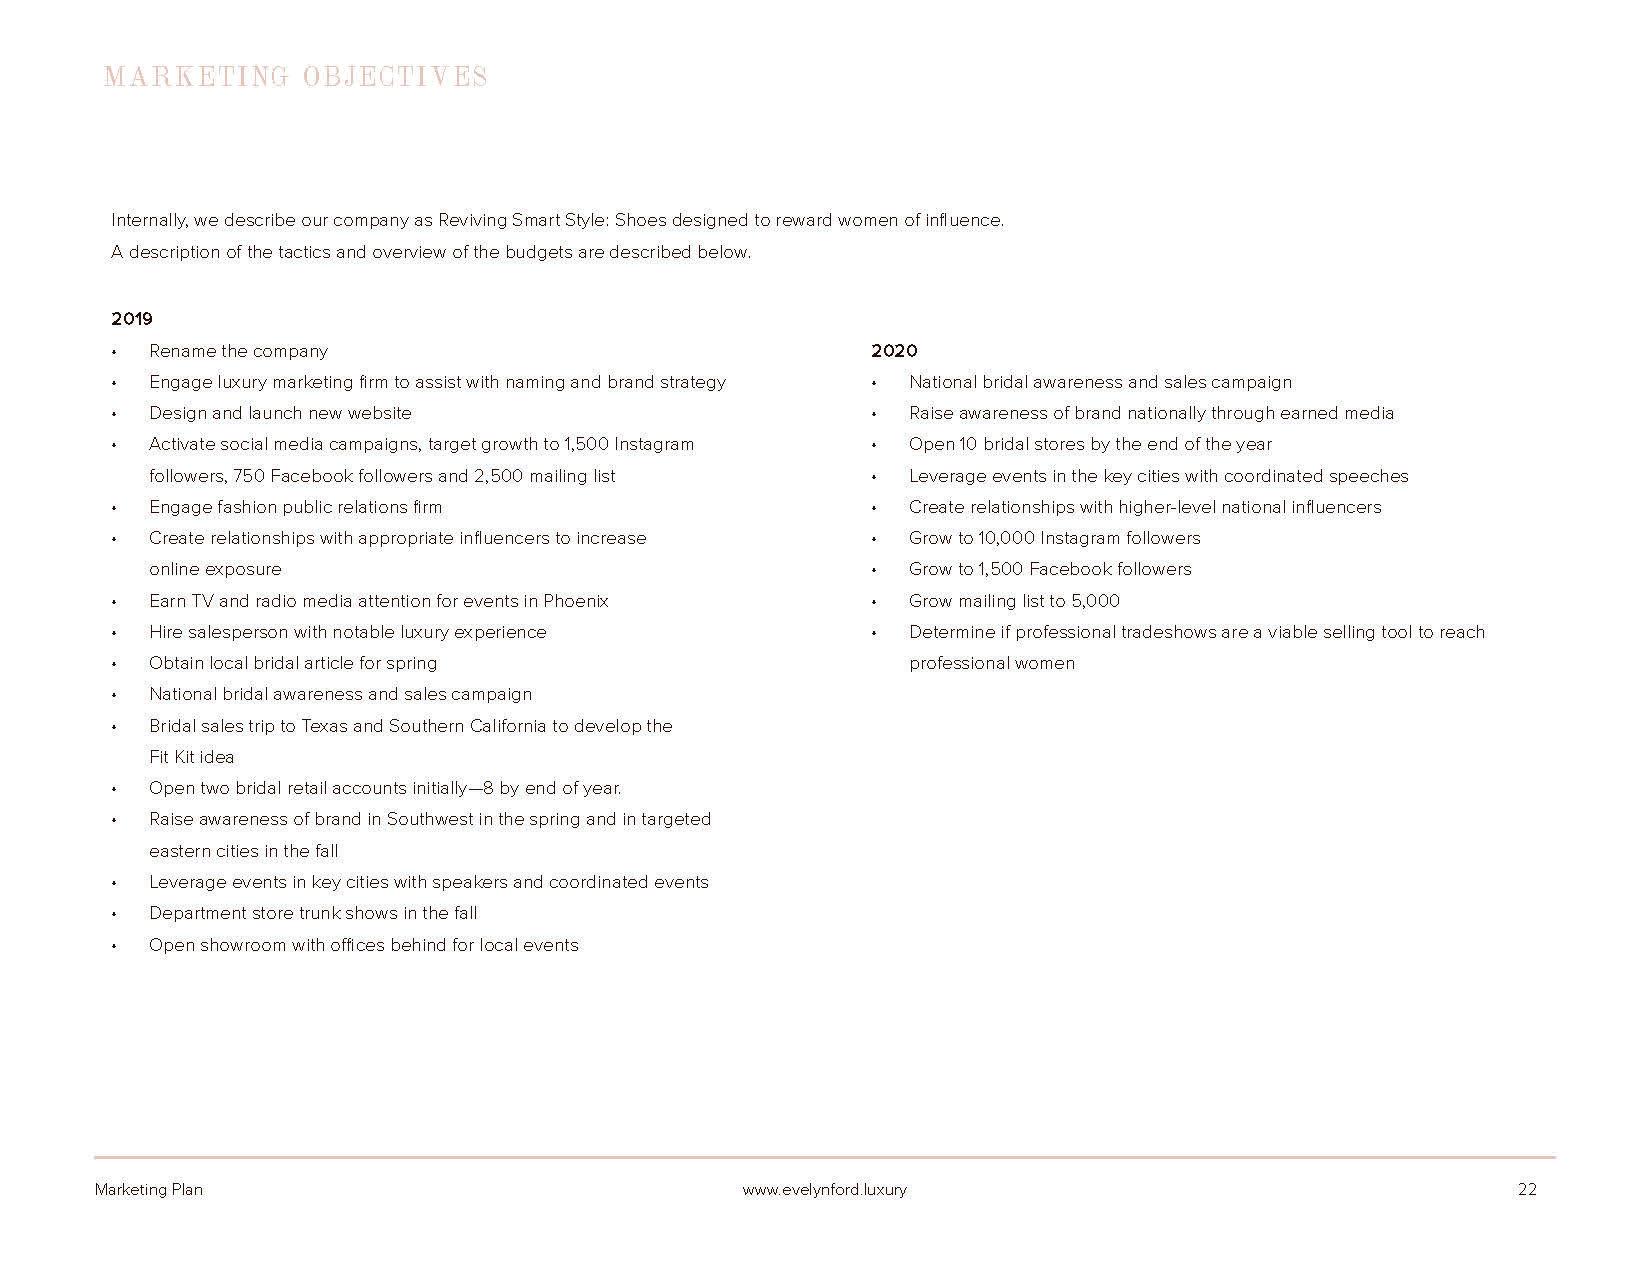 EFL_Marketing_Plan_110118_Page_22.jpg